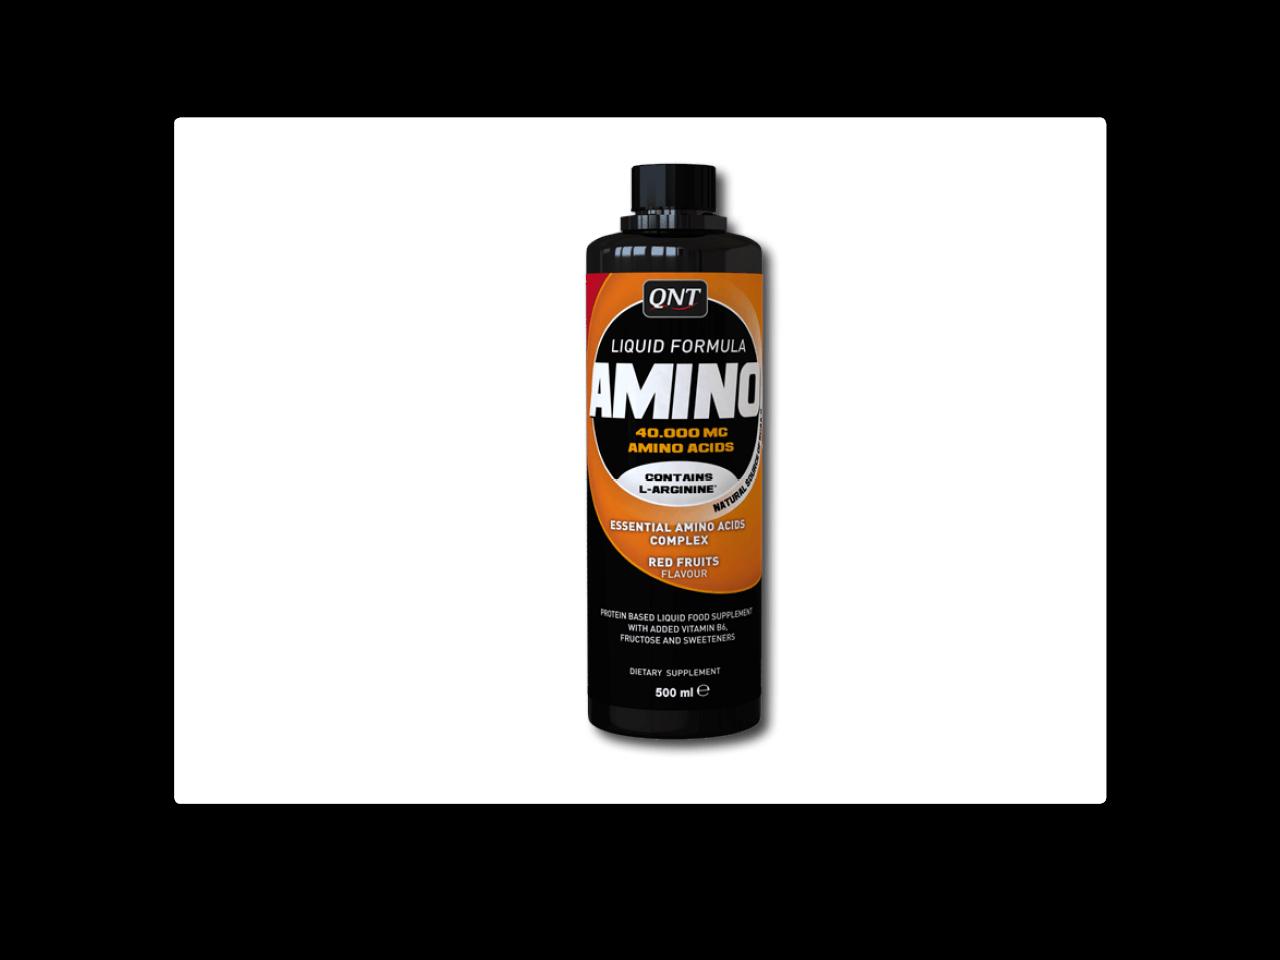 produktbilde-qnt-aminoacid